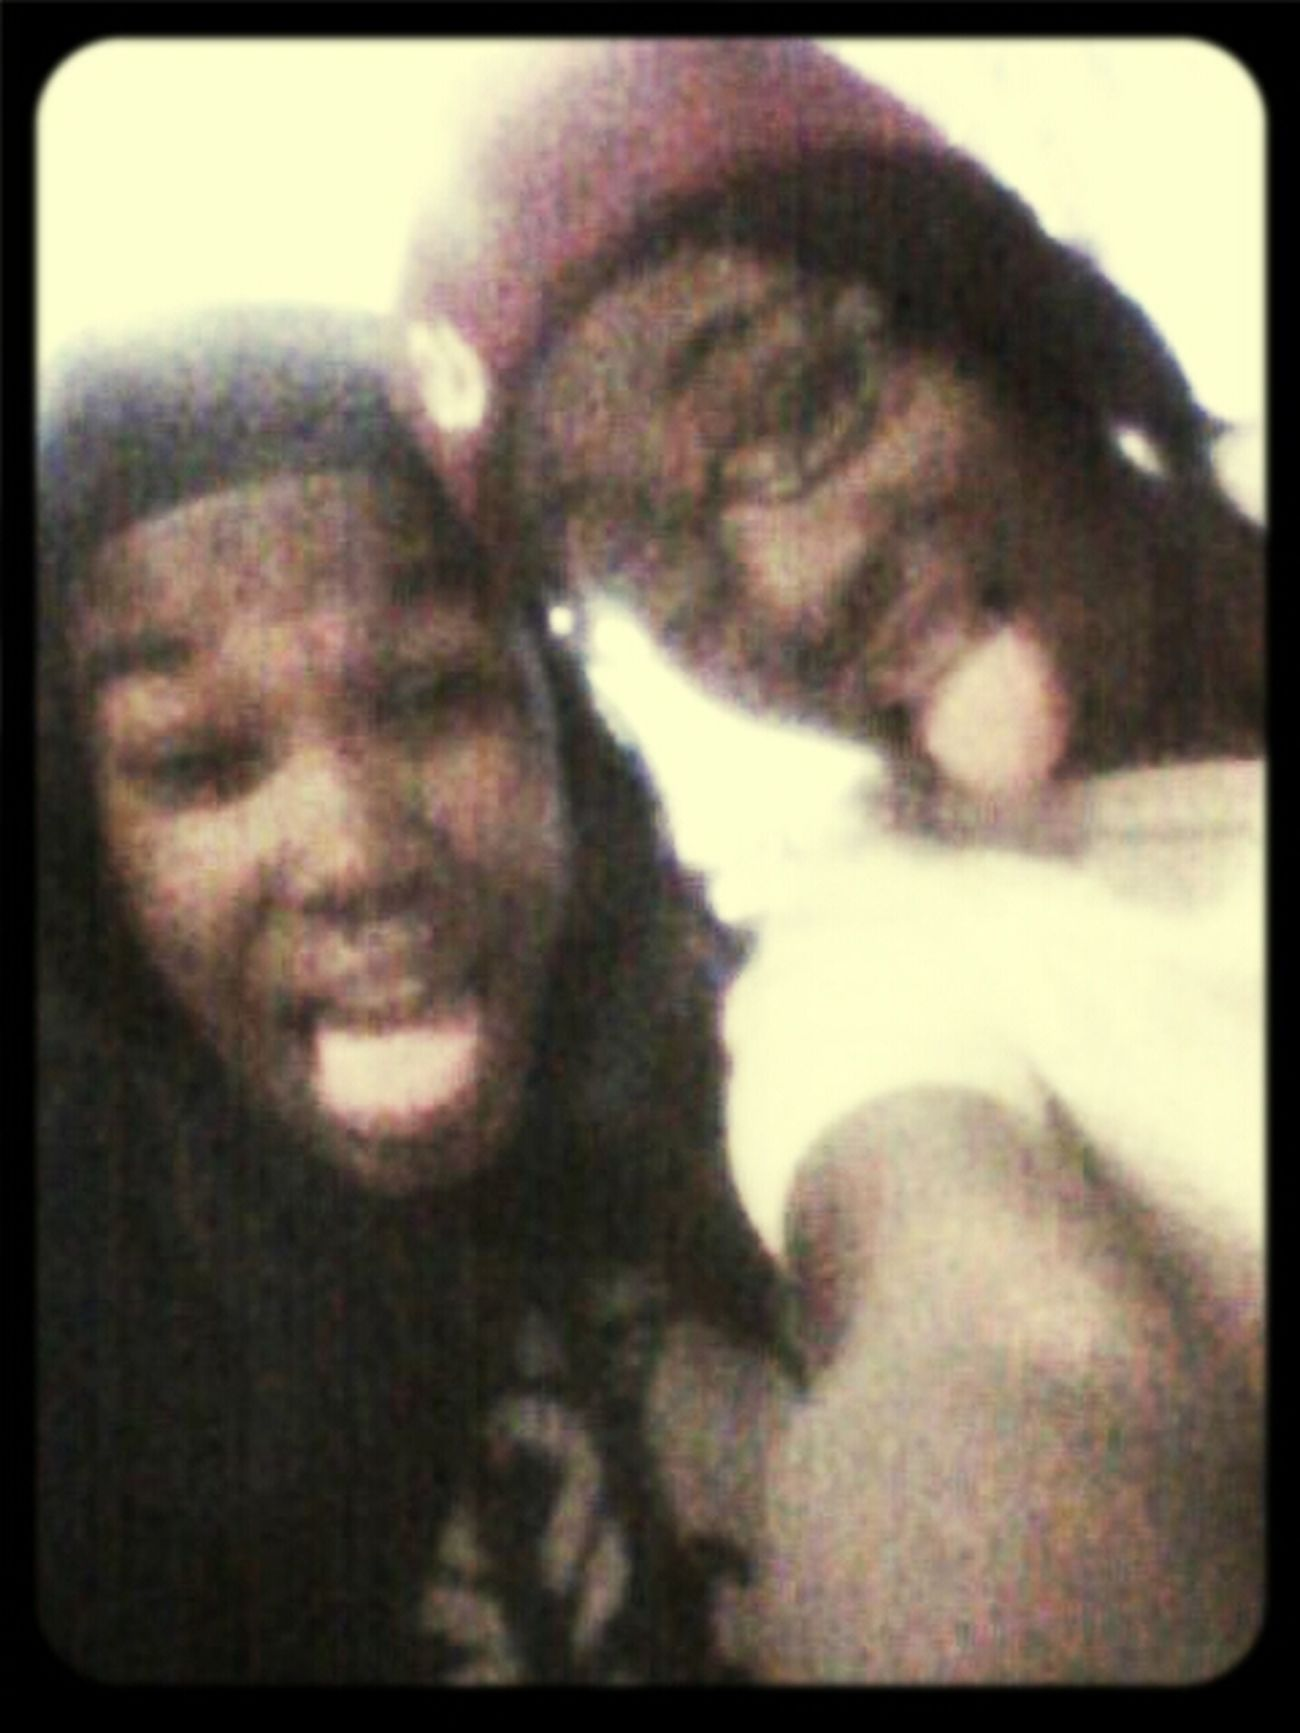 Me & My Bestfriend Thuggn ♡